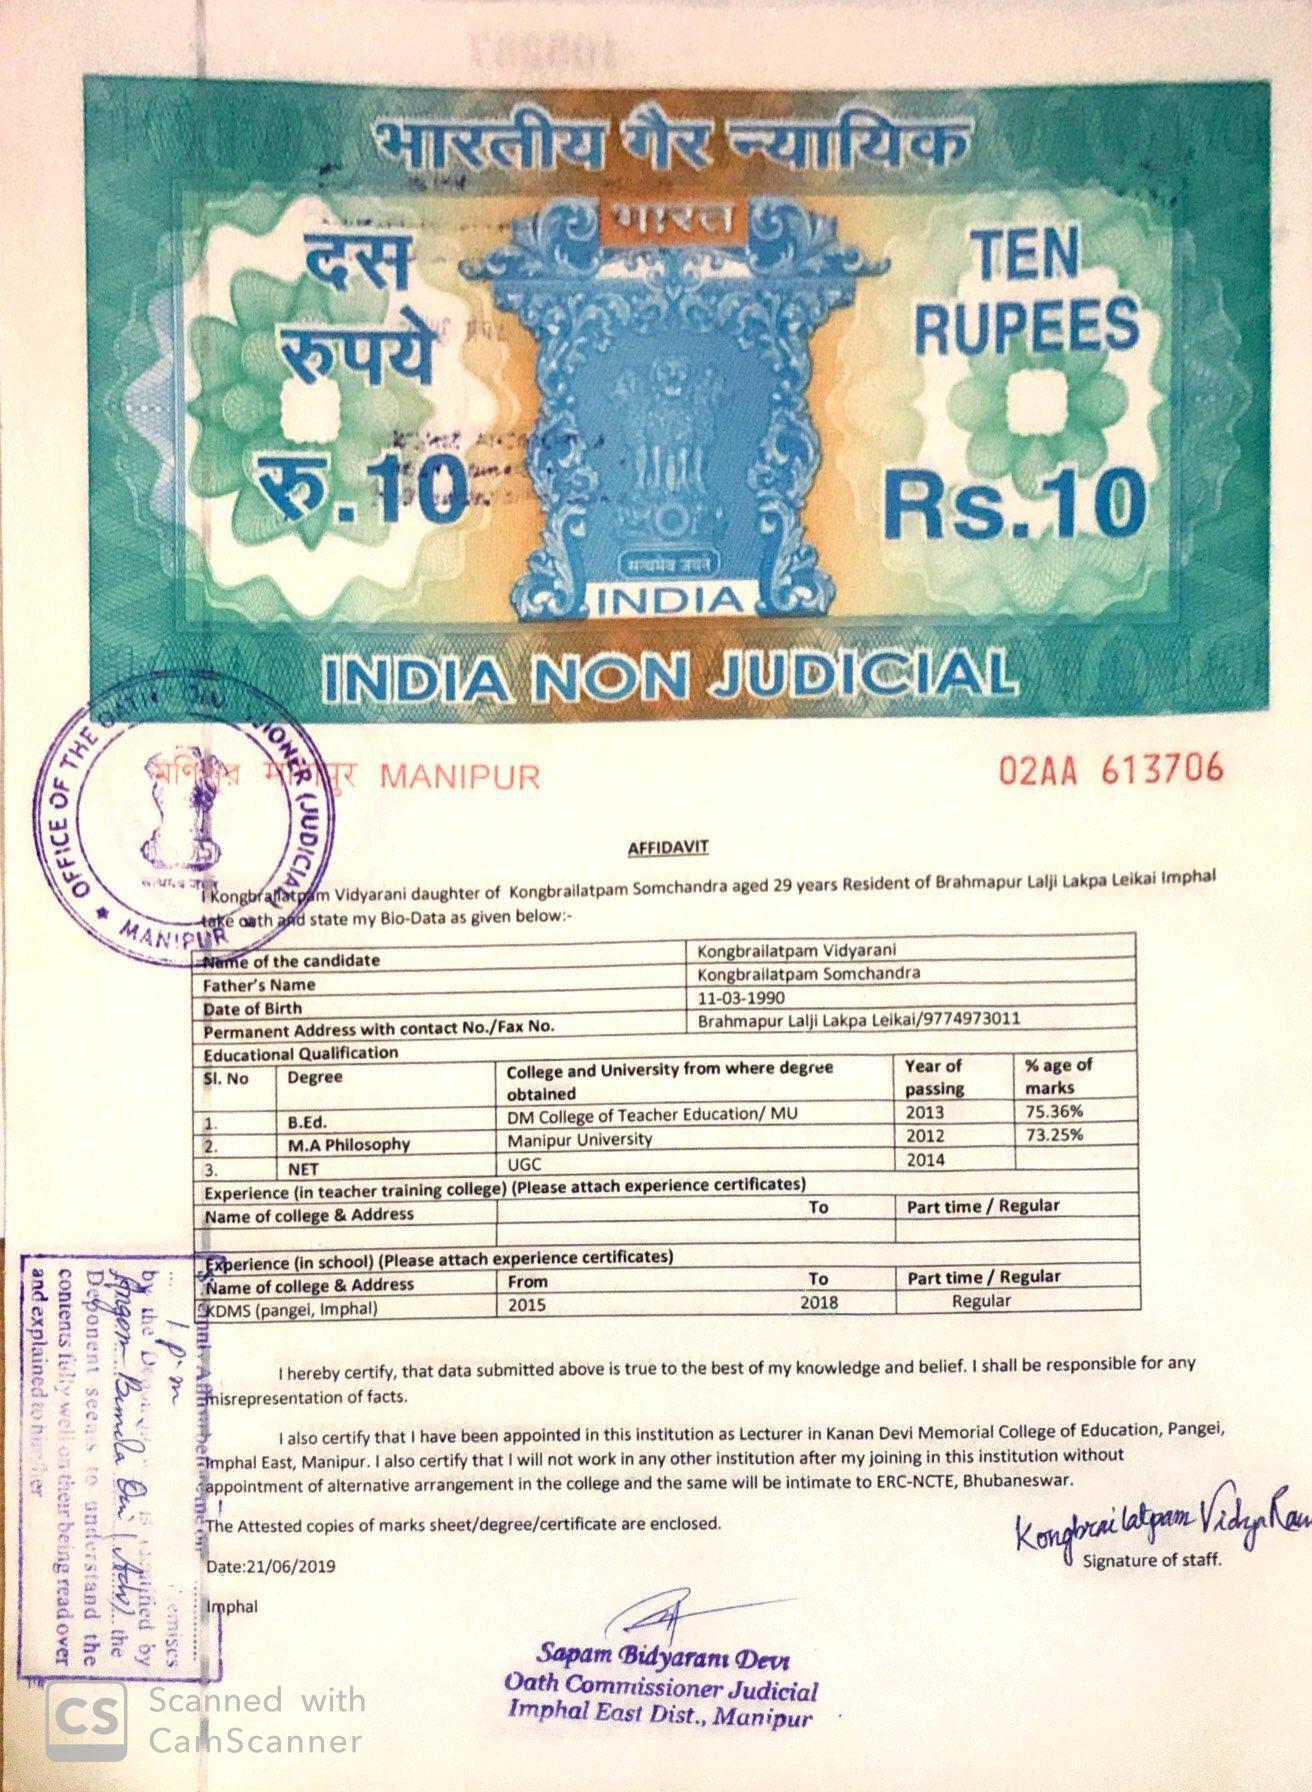 Kongbrailatpam Vidyarani